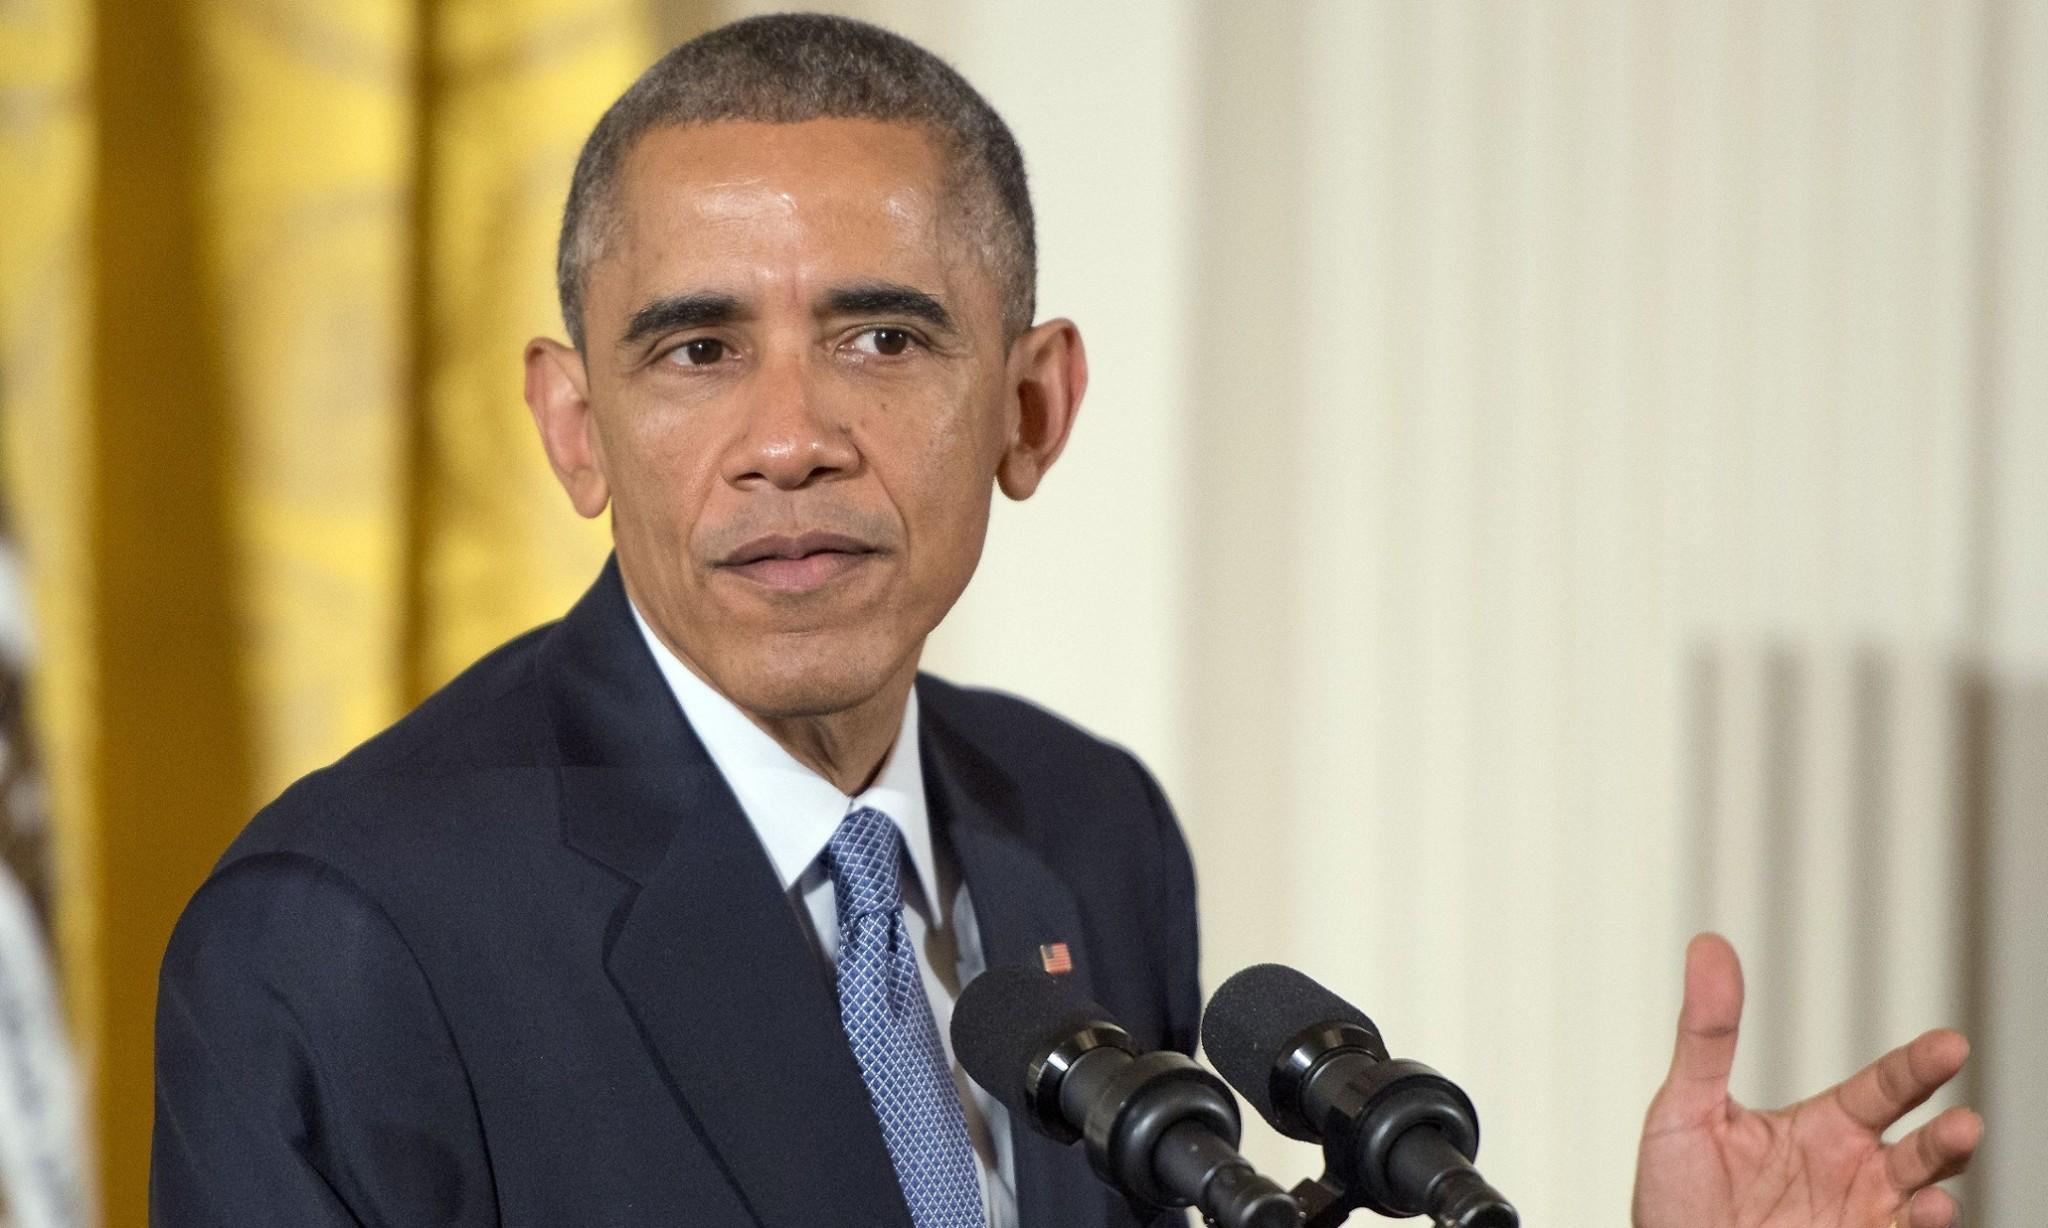 White House to revive NSA surveillance legislation during next Congress